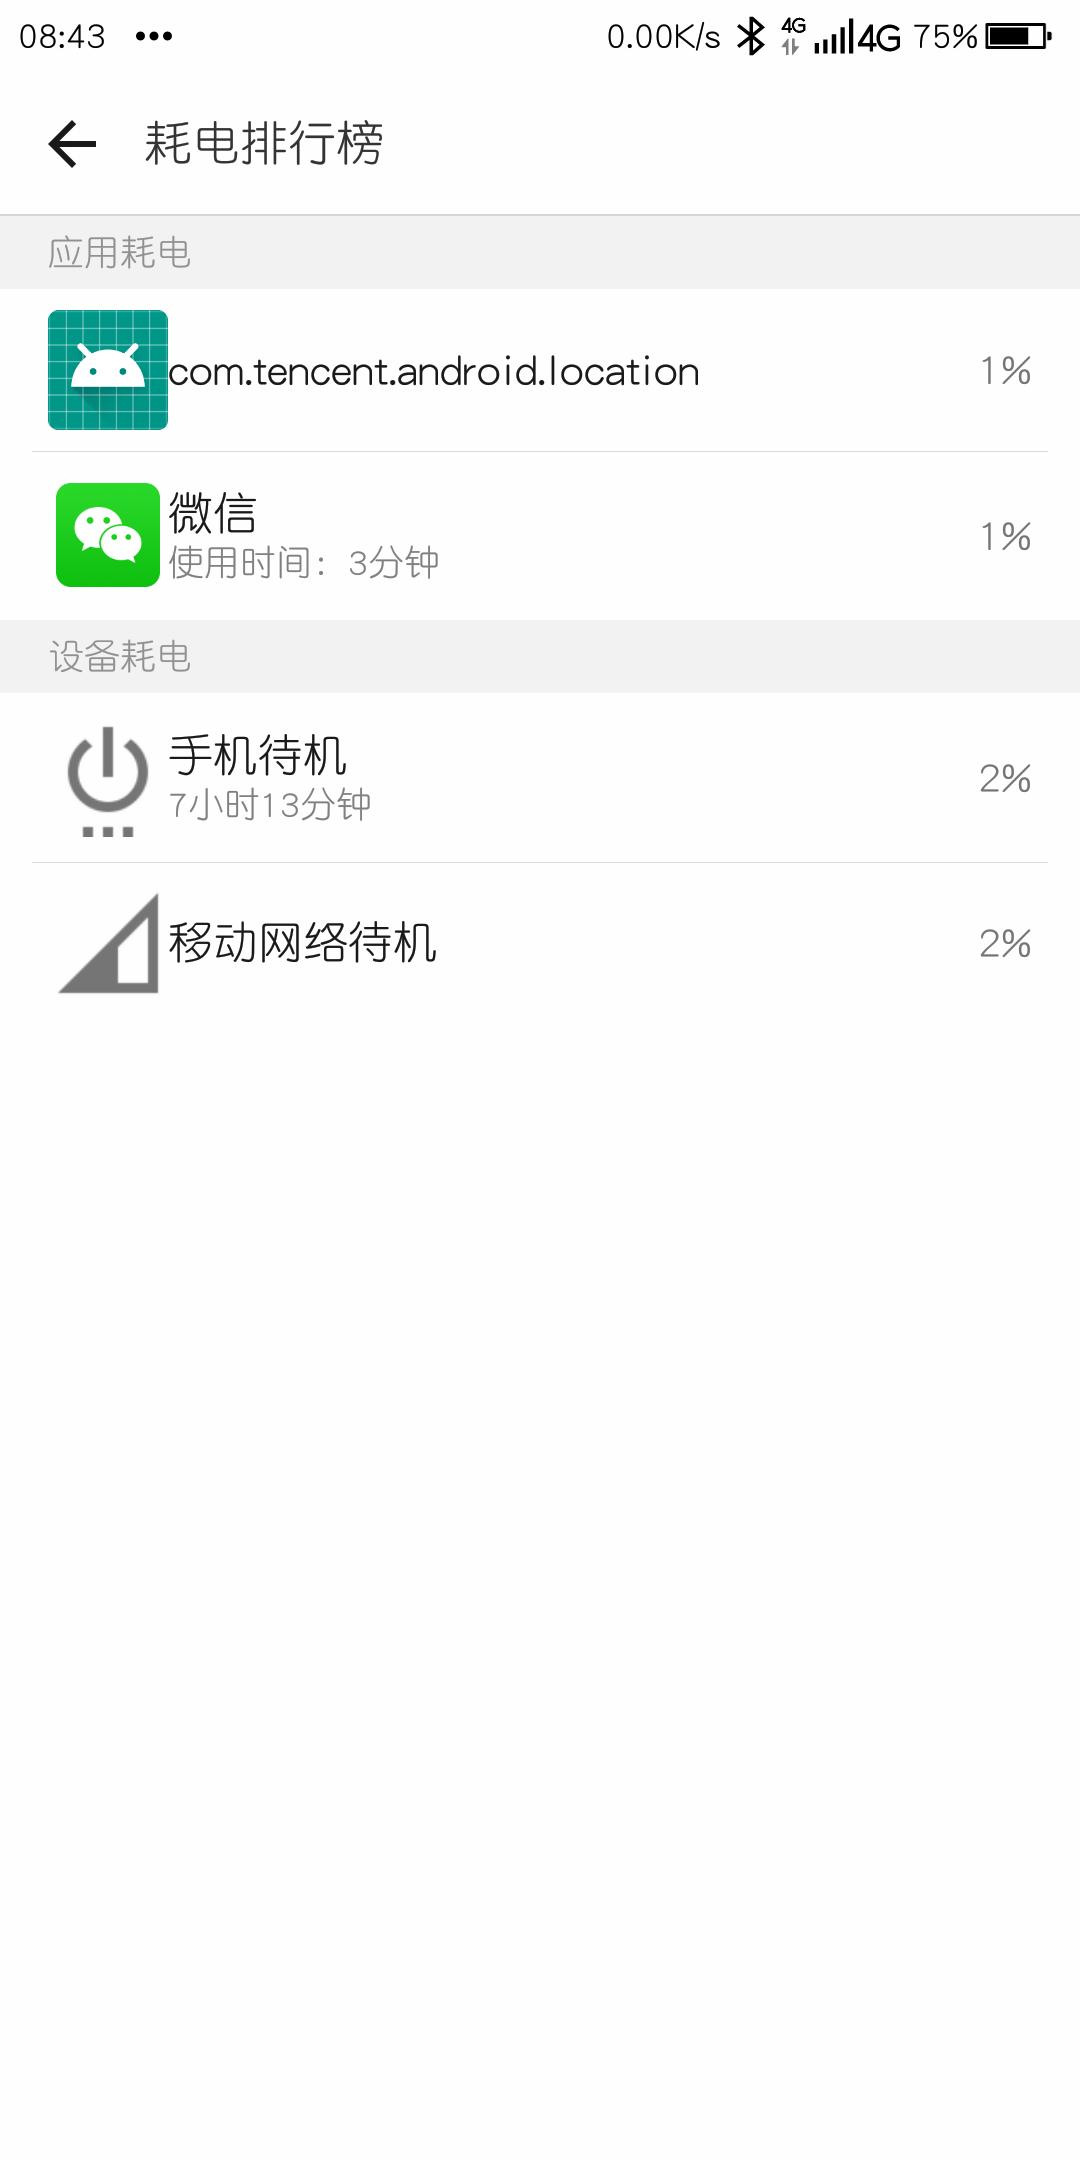 Screenshot_2018-12-10-08-43-52.png